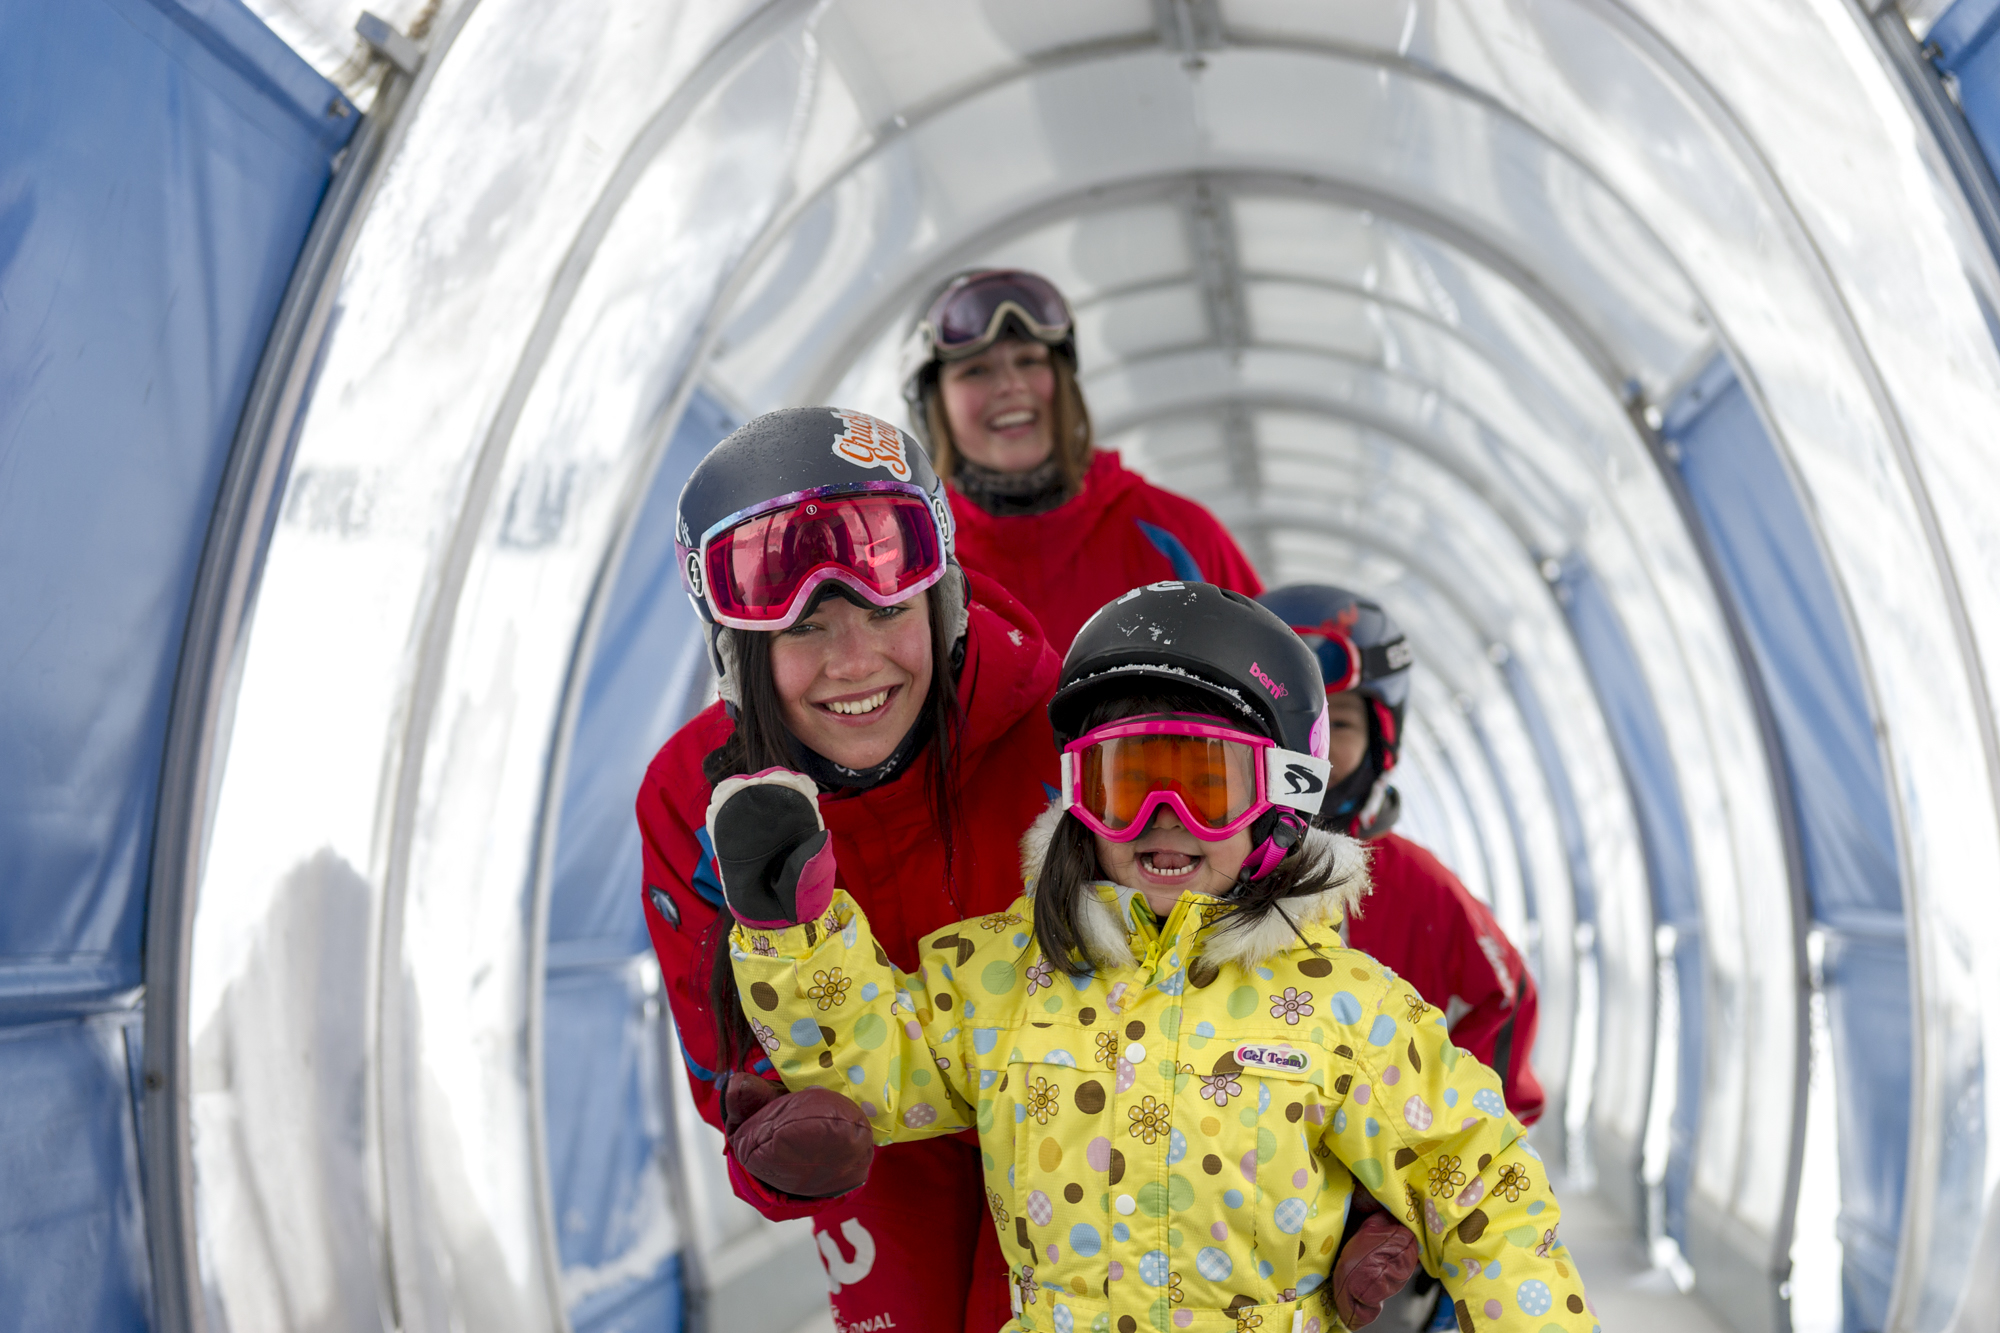 Children having fun with their ski instructors